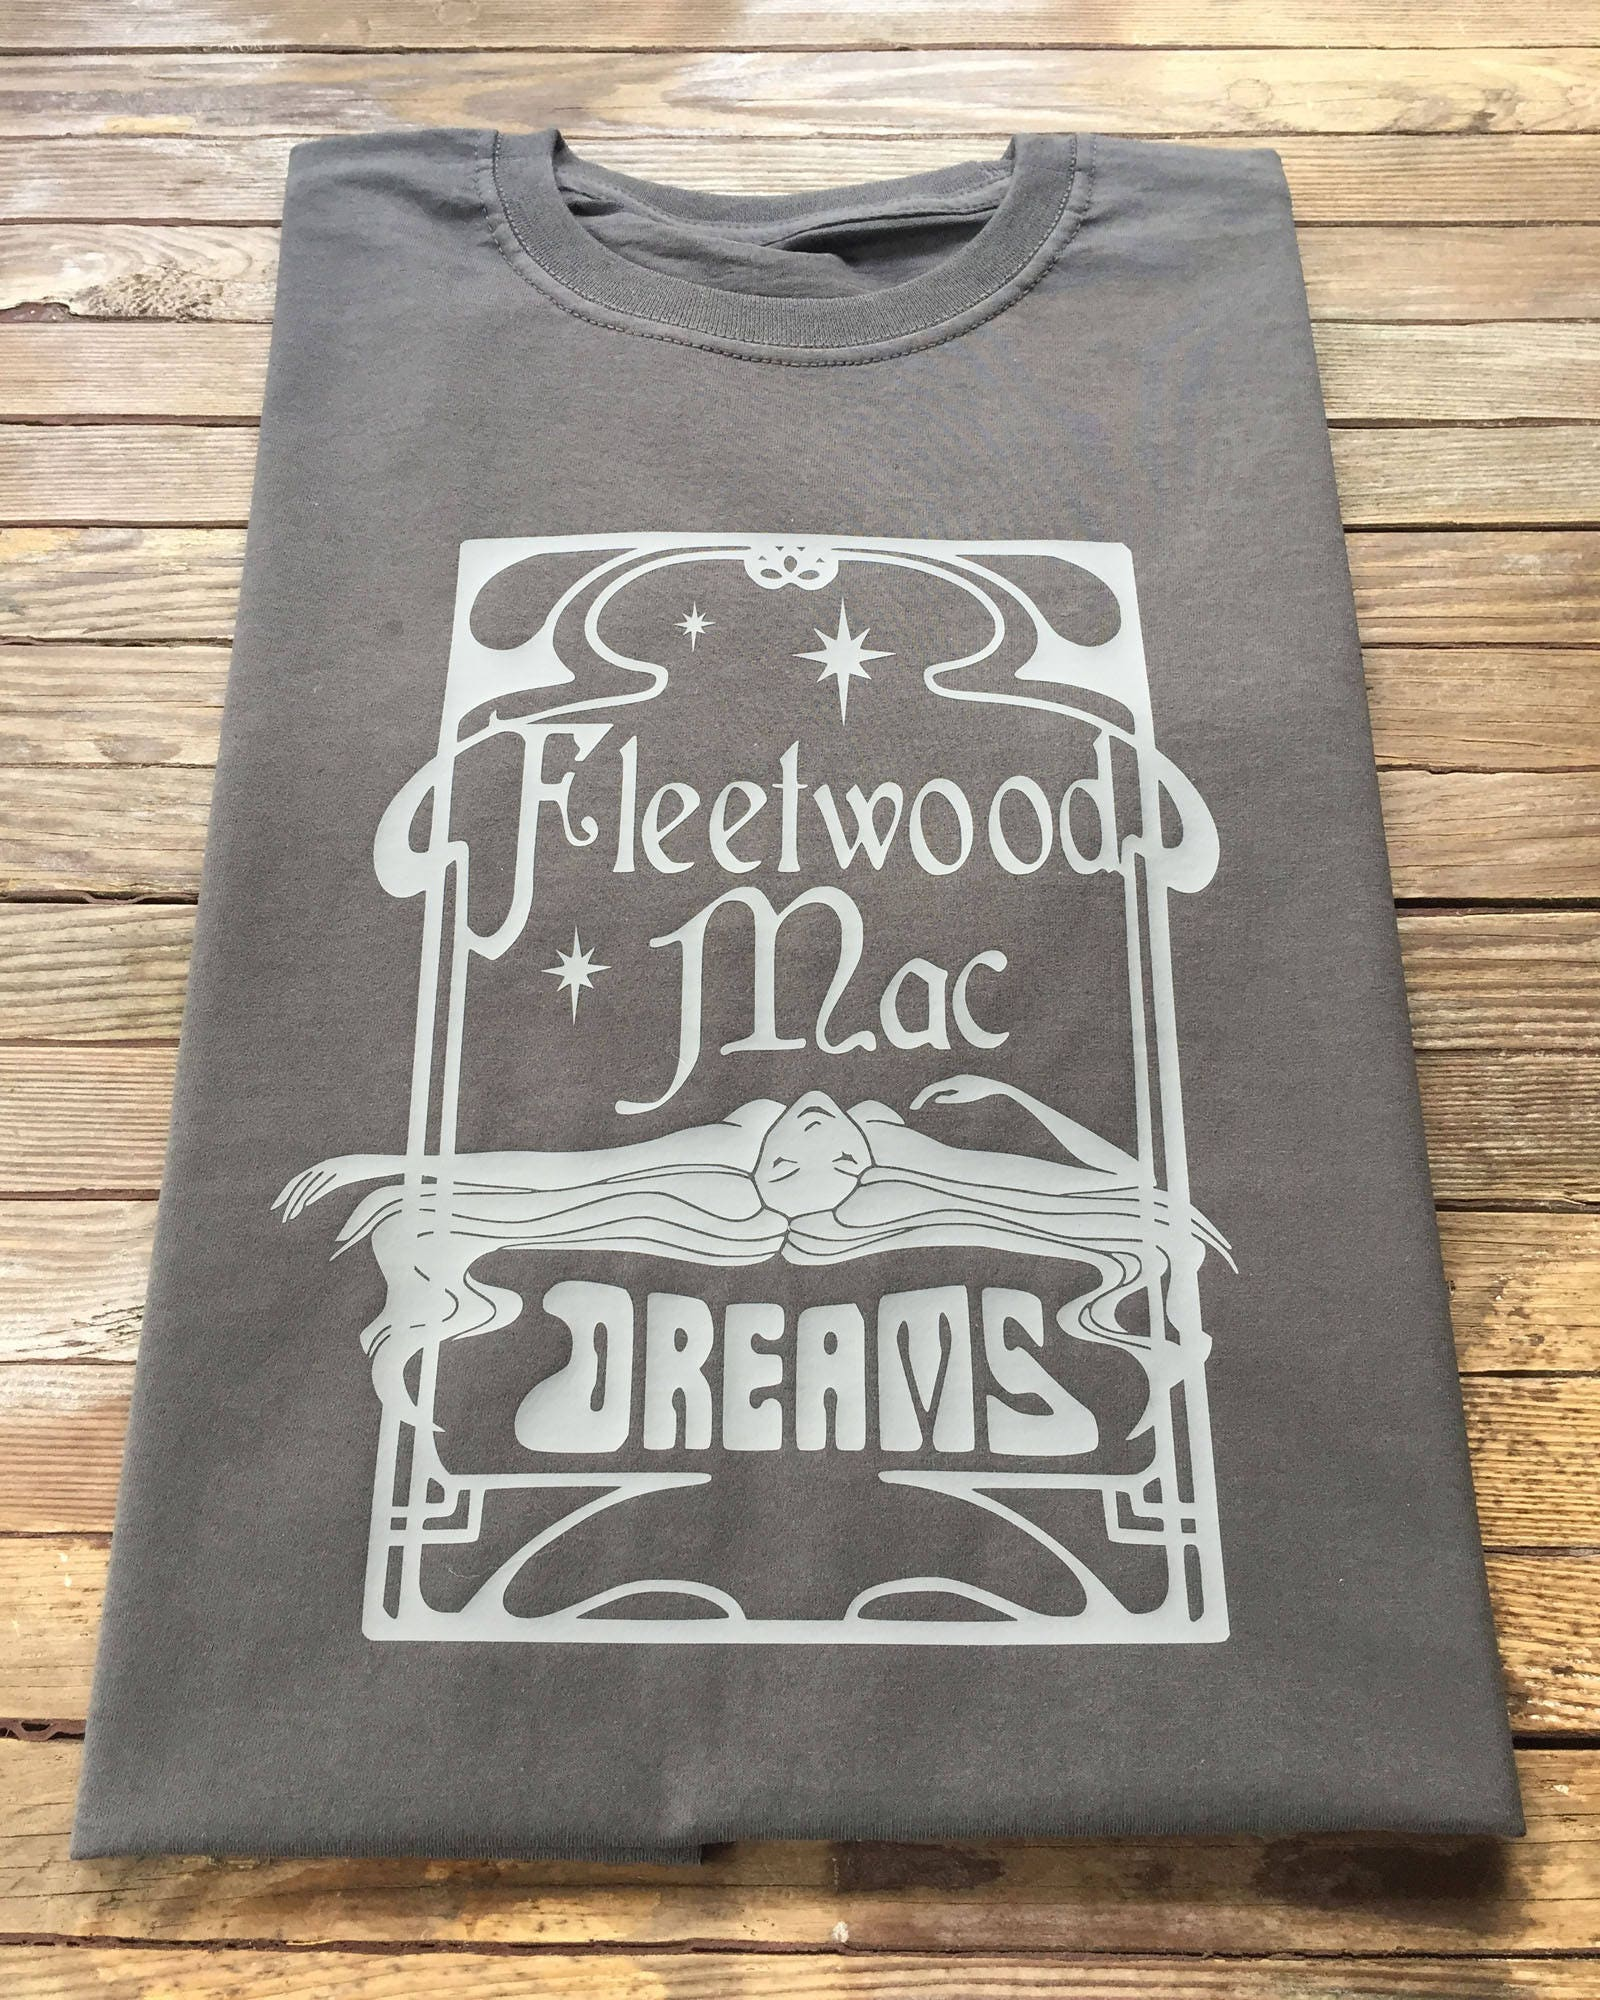 Design t shirt on mac - Fleetwood Mac T Shirt Graphic Art Nouveau Design Dreams Stevie Nicks Rumours